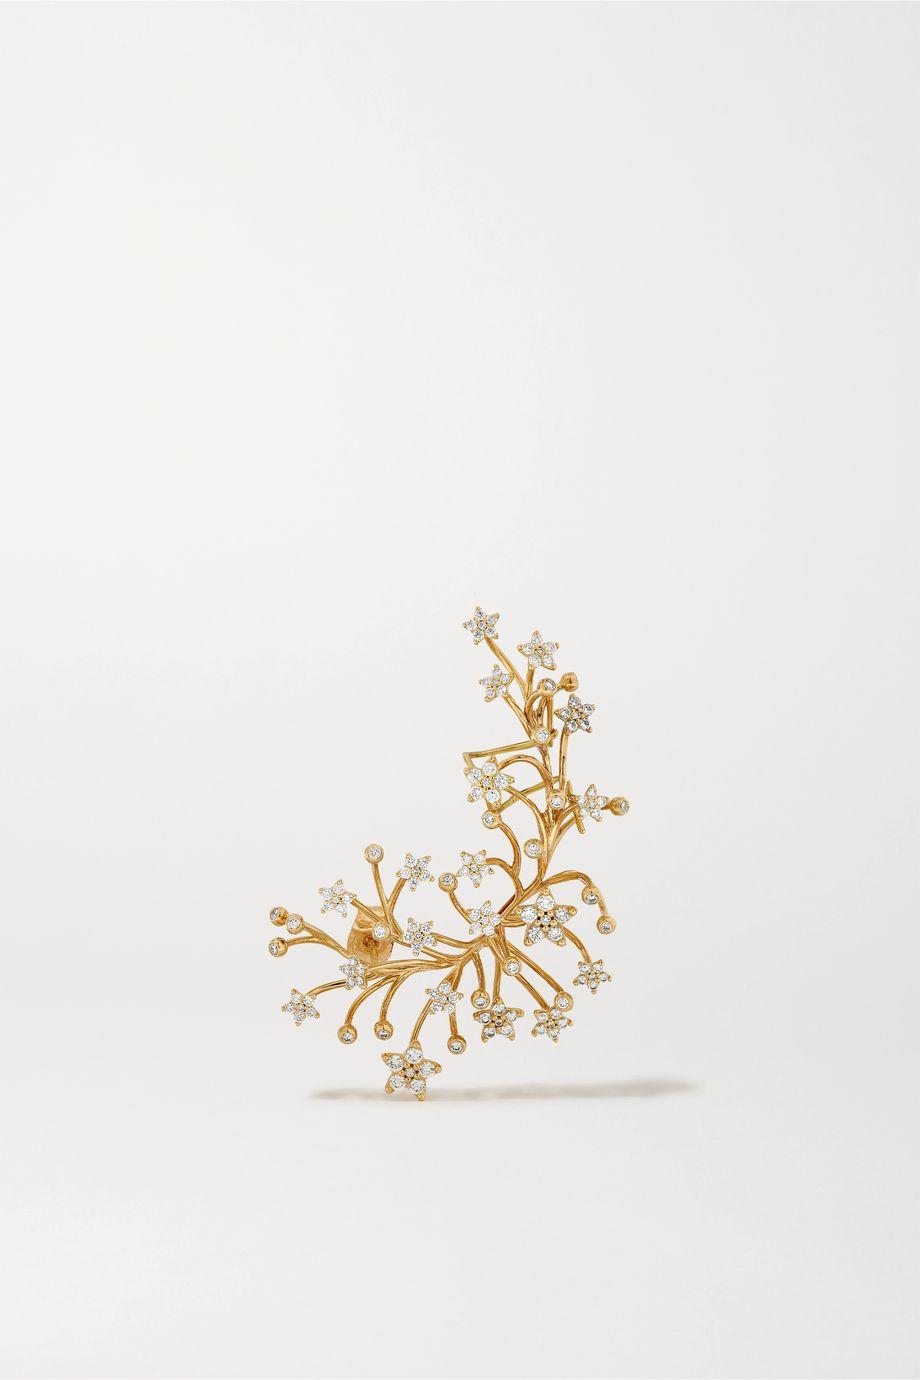 OLE LYNGGAARD COPENHAGEN Shooting Star 18-karat gold diamond ear cuff